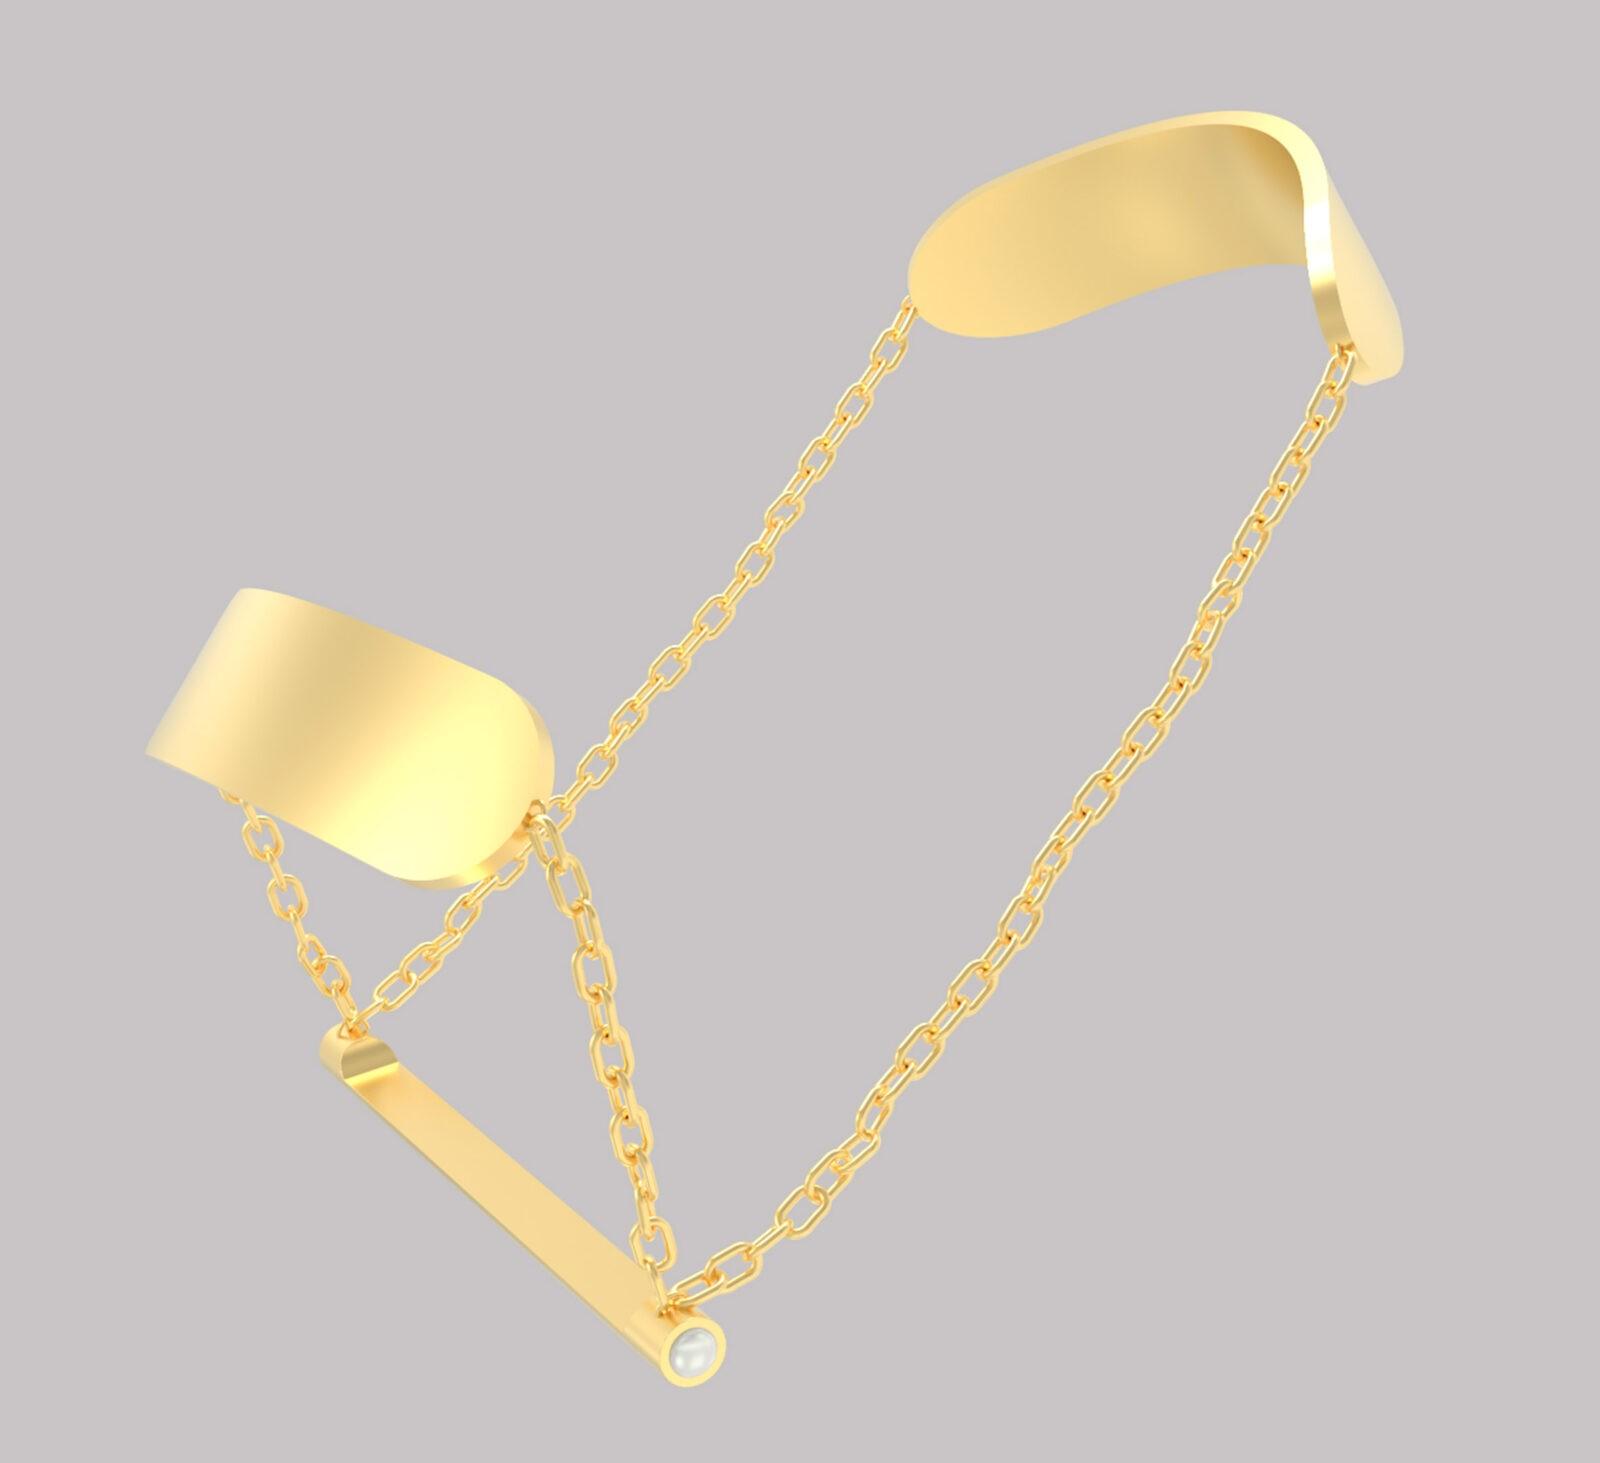 sara sallam orwell jewellery design dezeen 2364 col 1